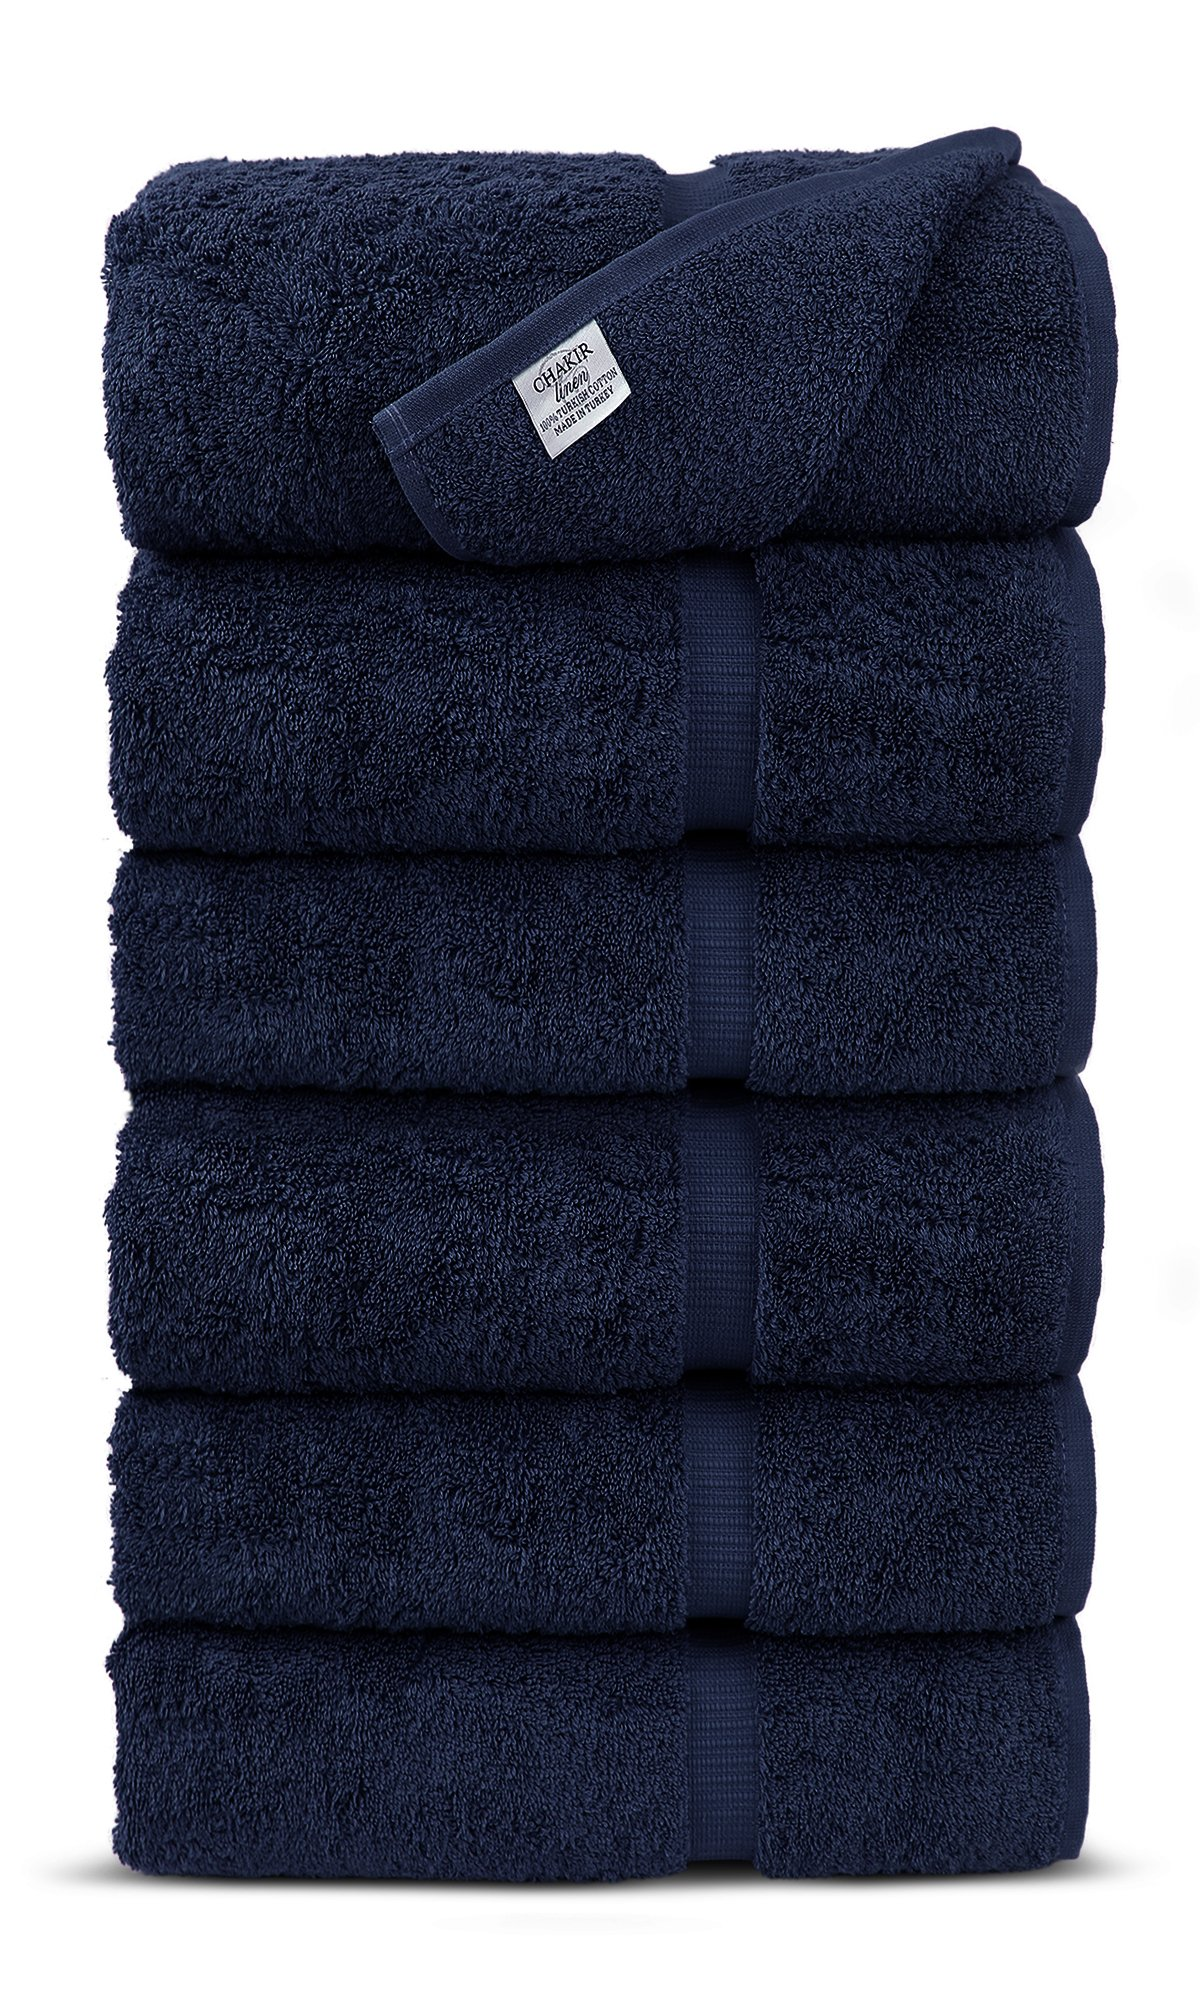 Luxury Premium long-stable Hotel & Spa Turkish Cotton 6-Piece Eco-Friendly Hand Towel Set (Navy)